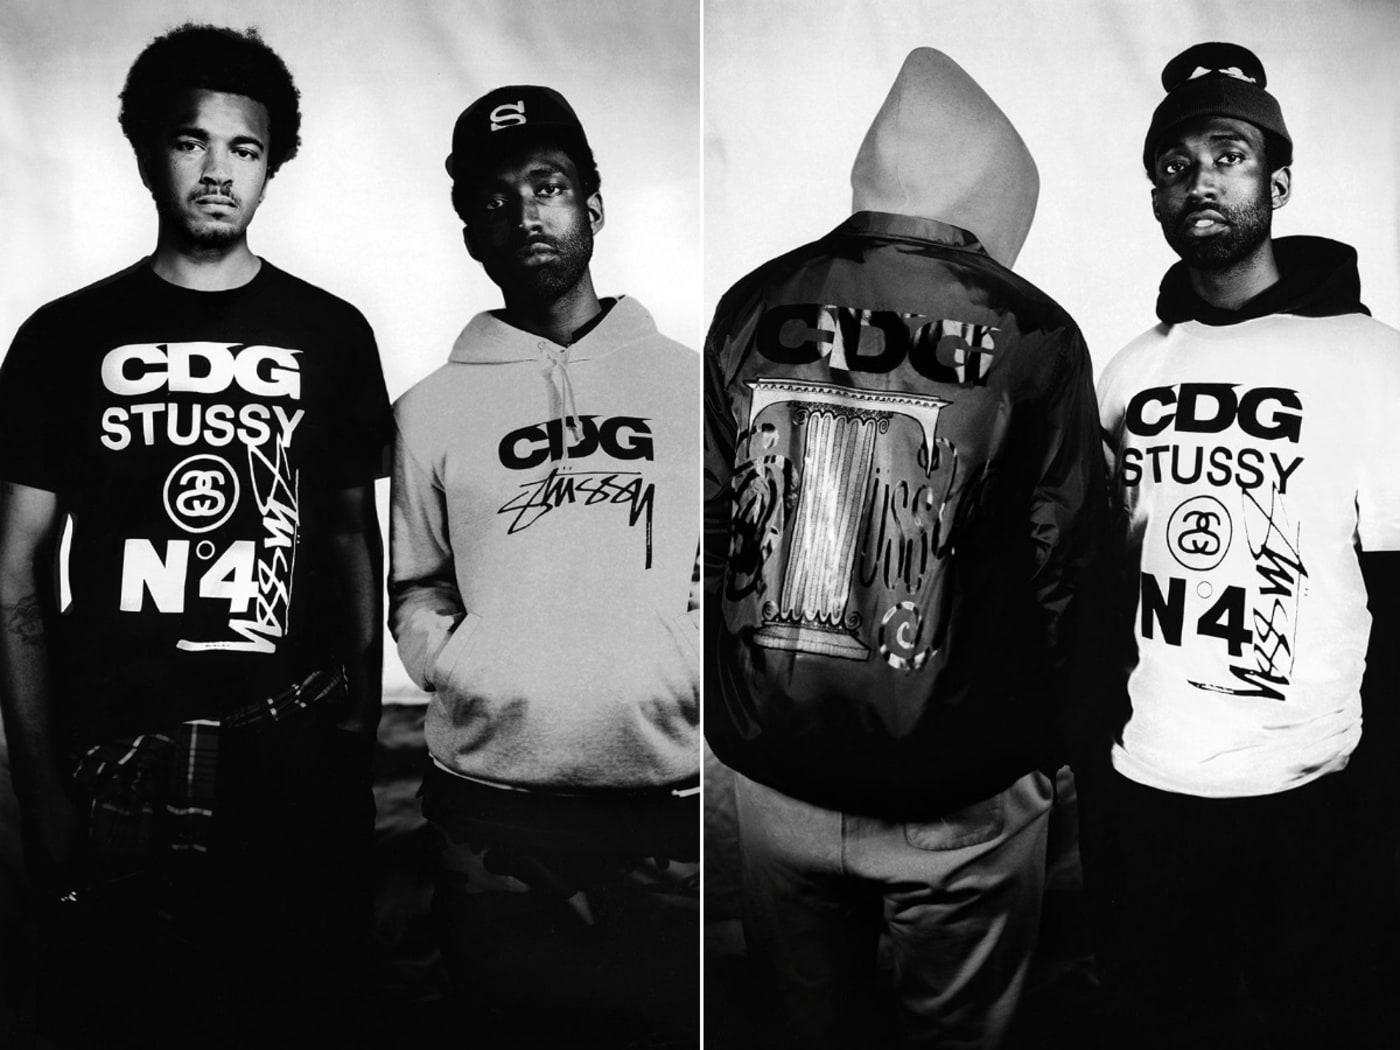 cdg-stussy-lead